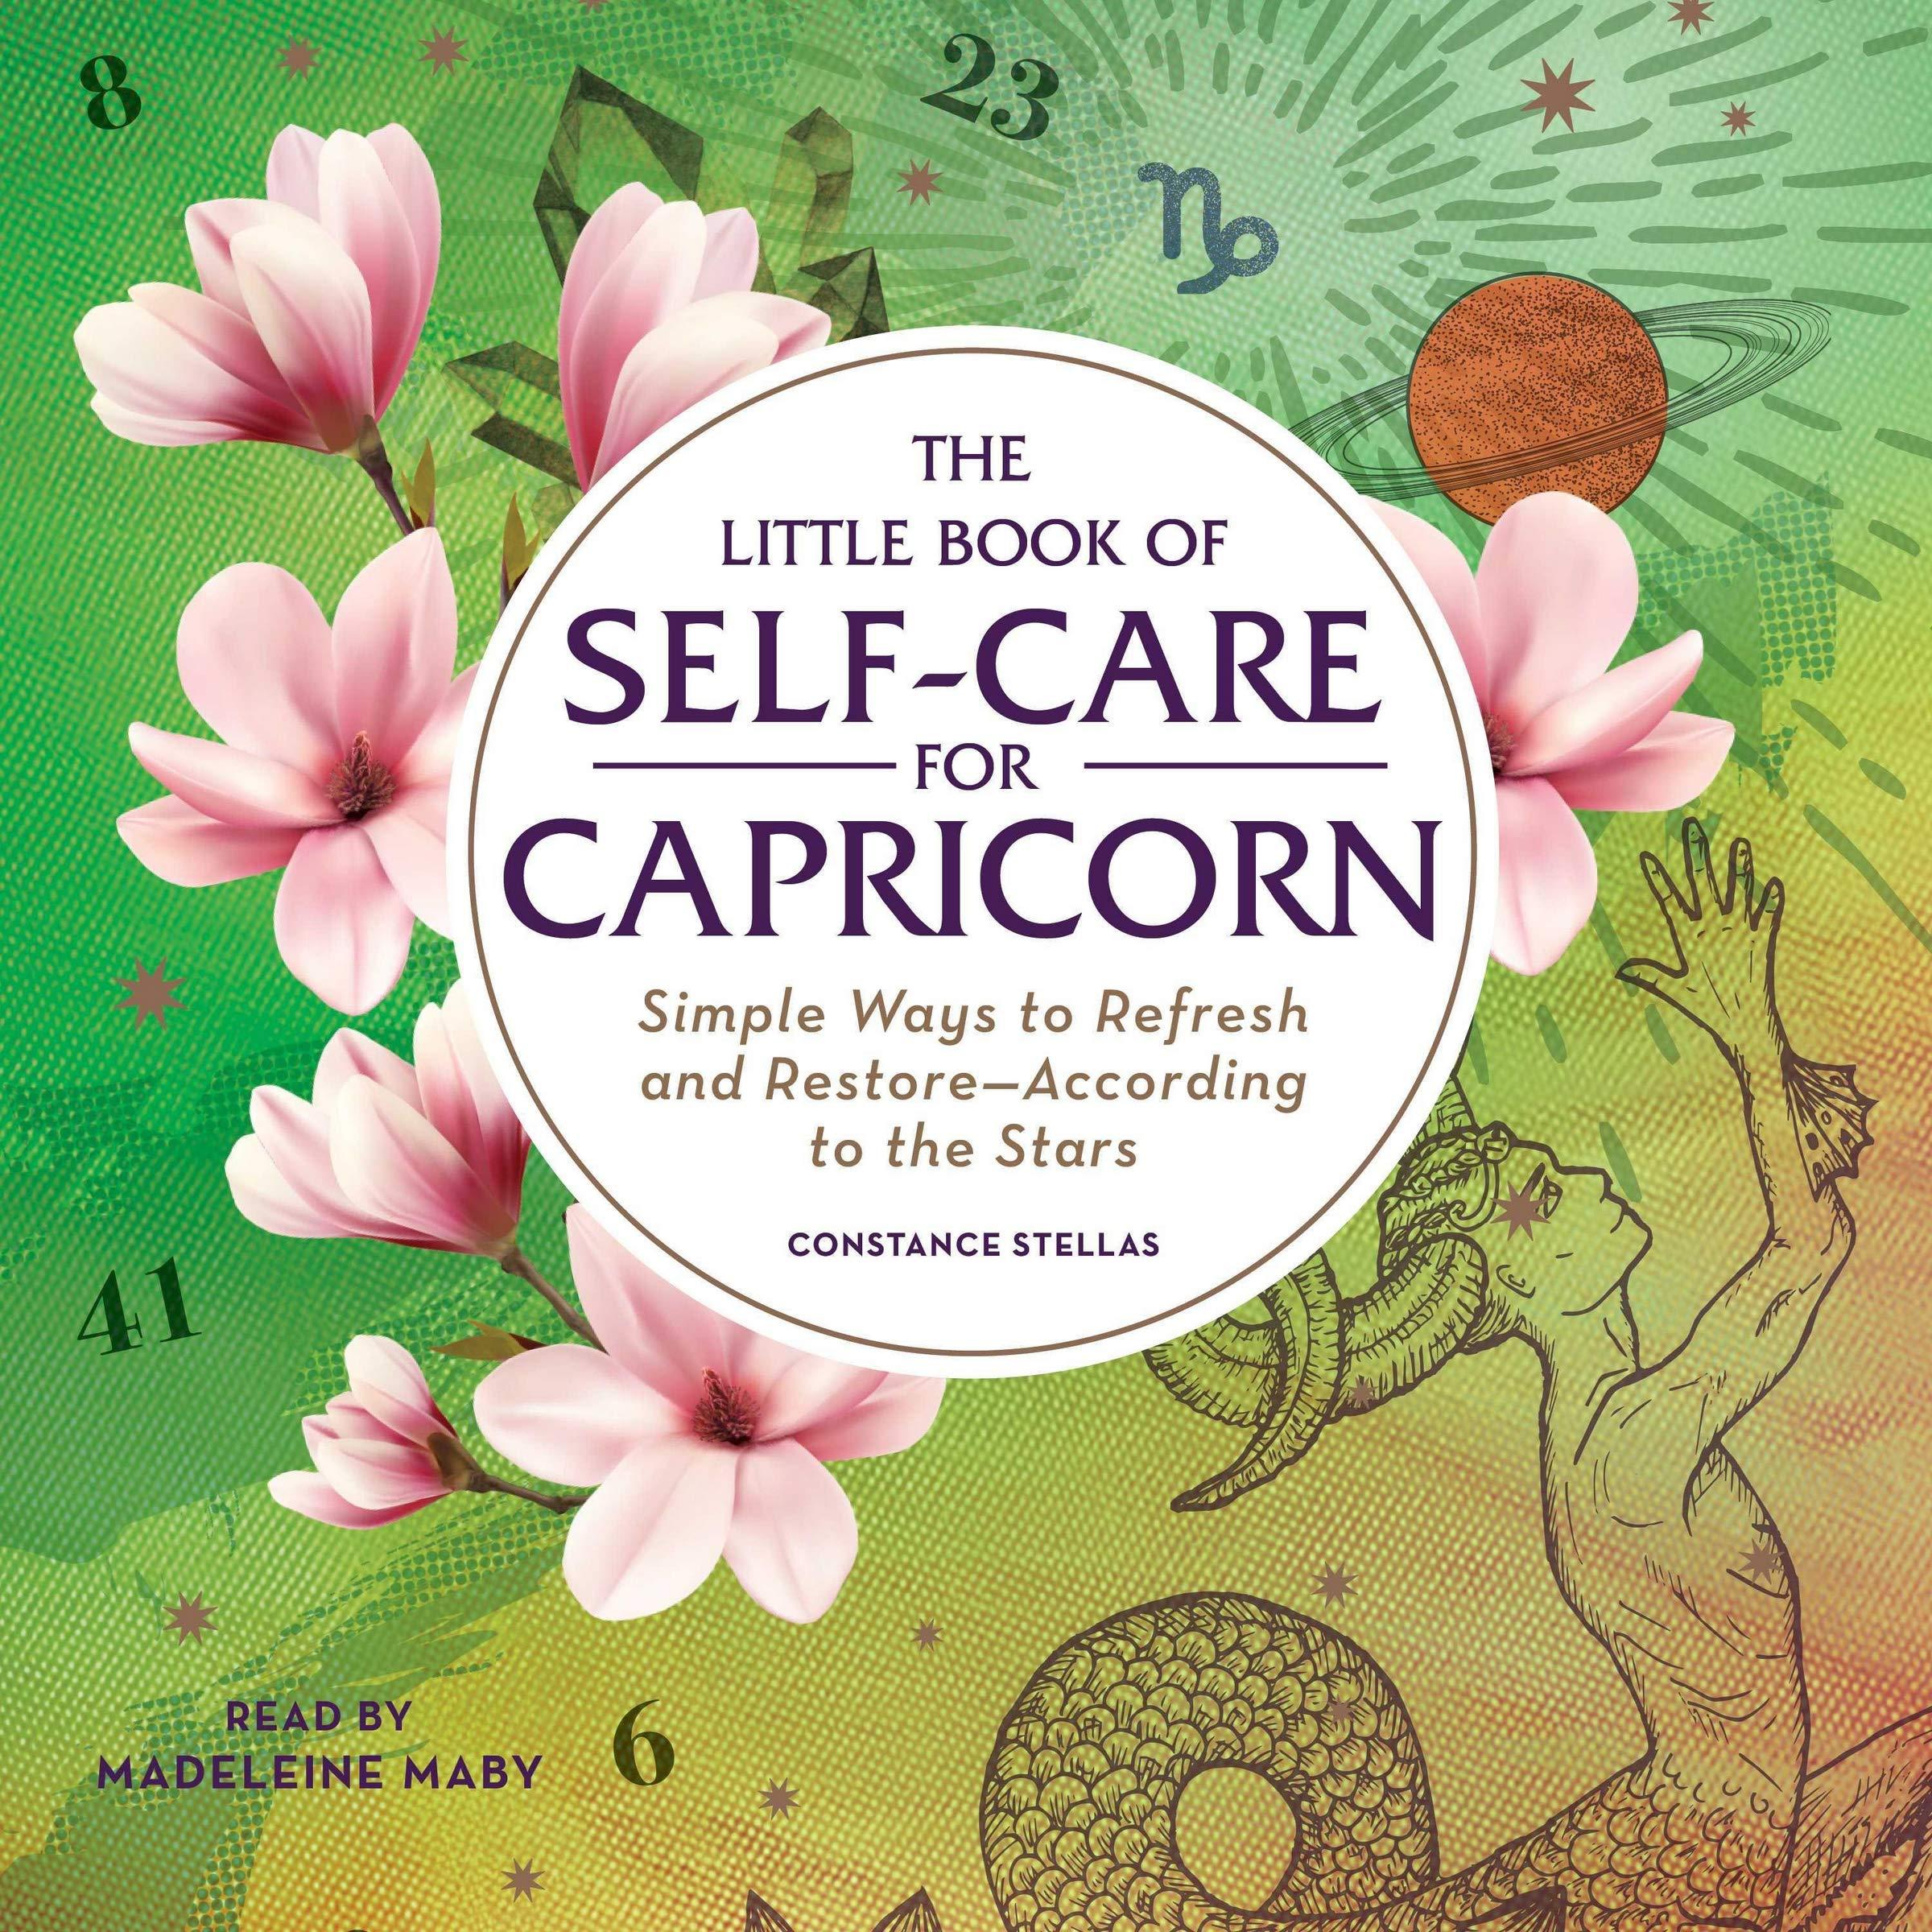 Capricorn 20 Horoscope Build A Solid Foundation   StyleCaster